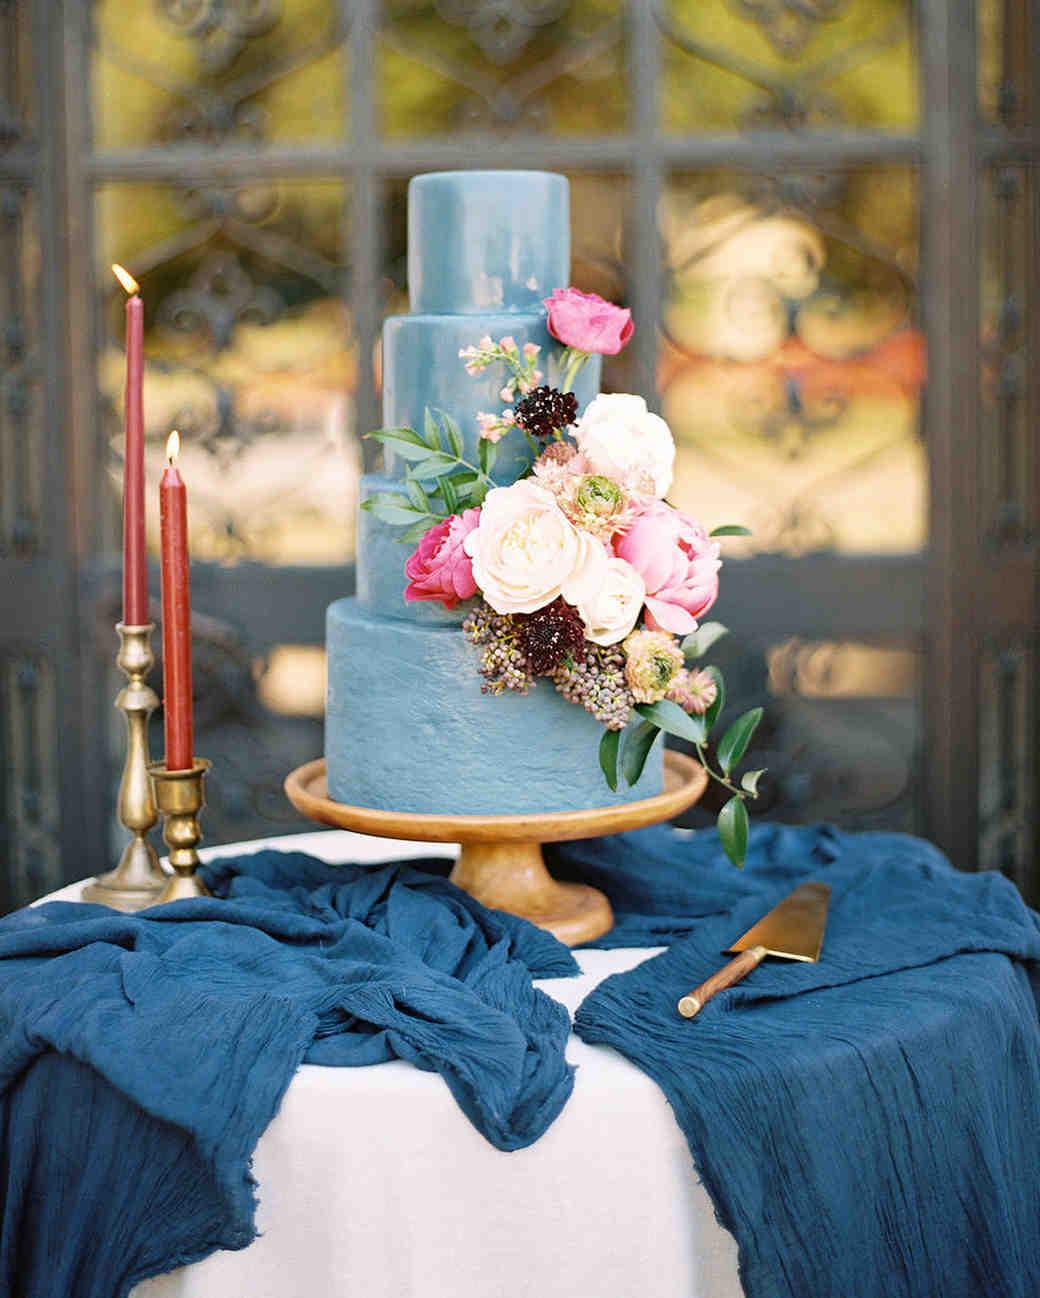 yolanda cedric wedding cake